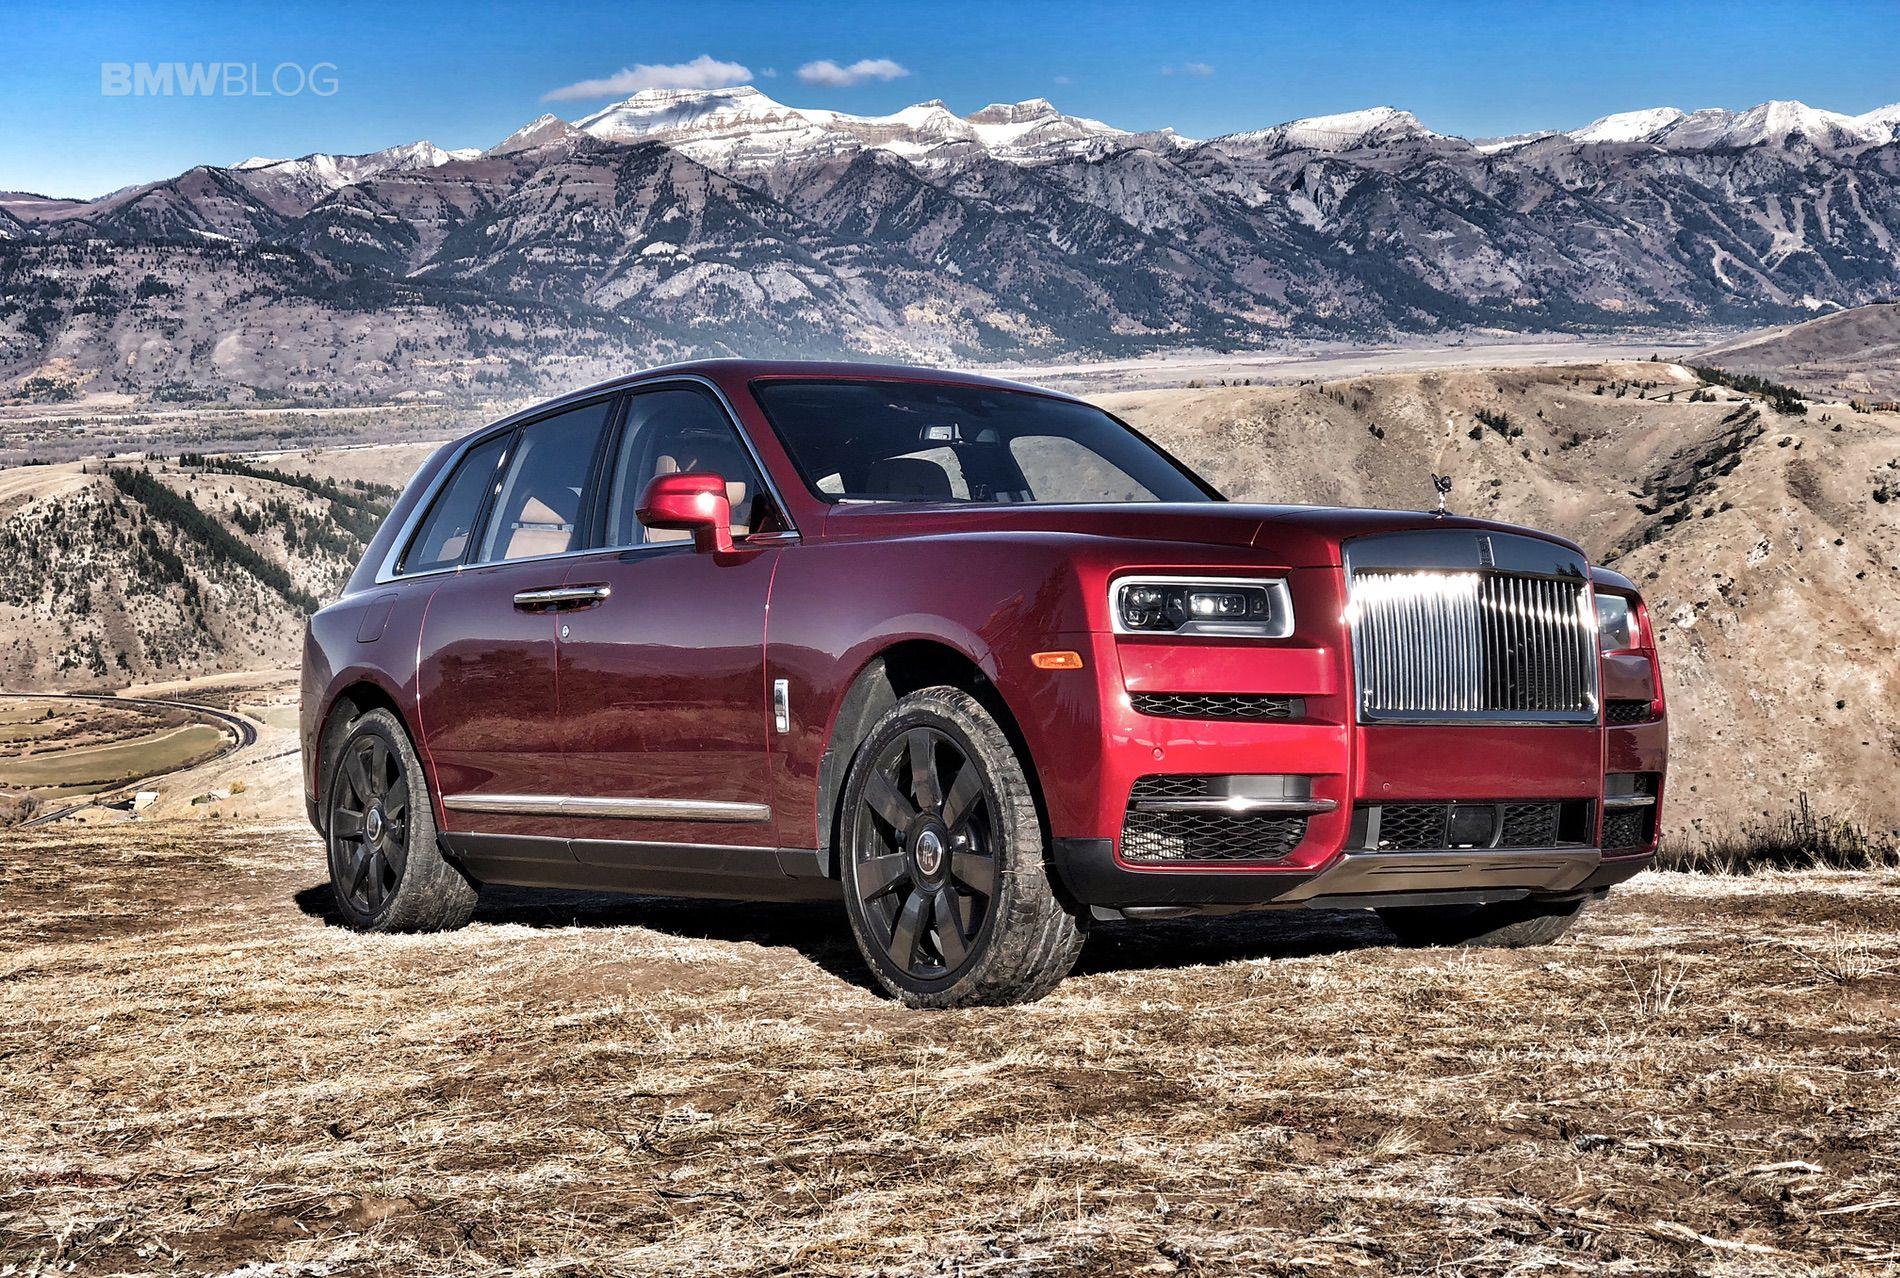 Video Rolls Royce Cullinan Review Claims Phantom Is Still